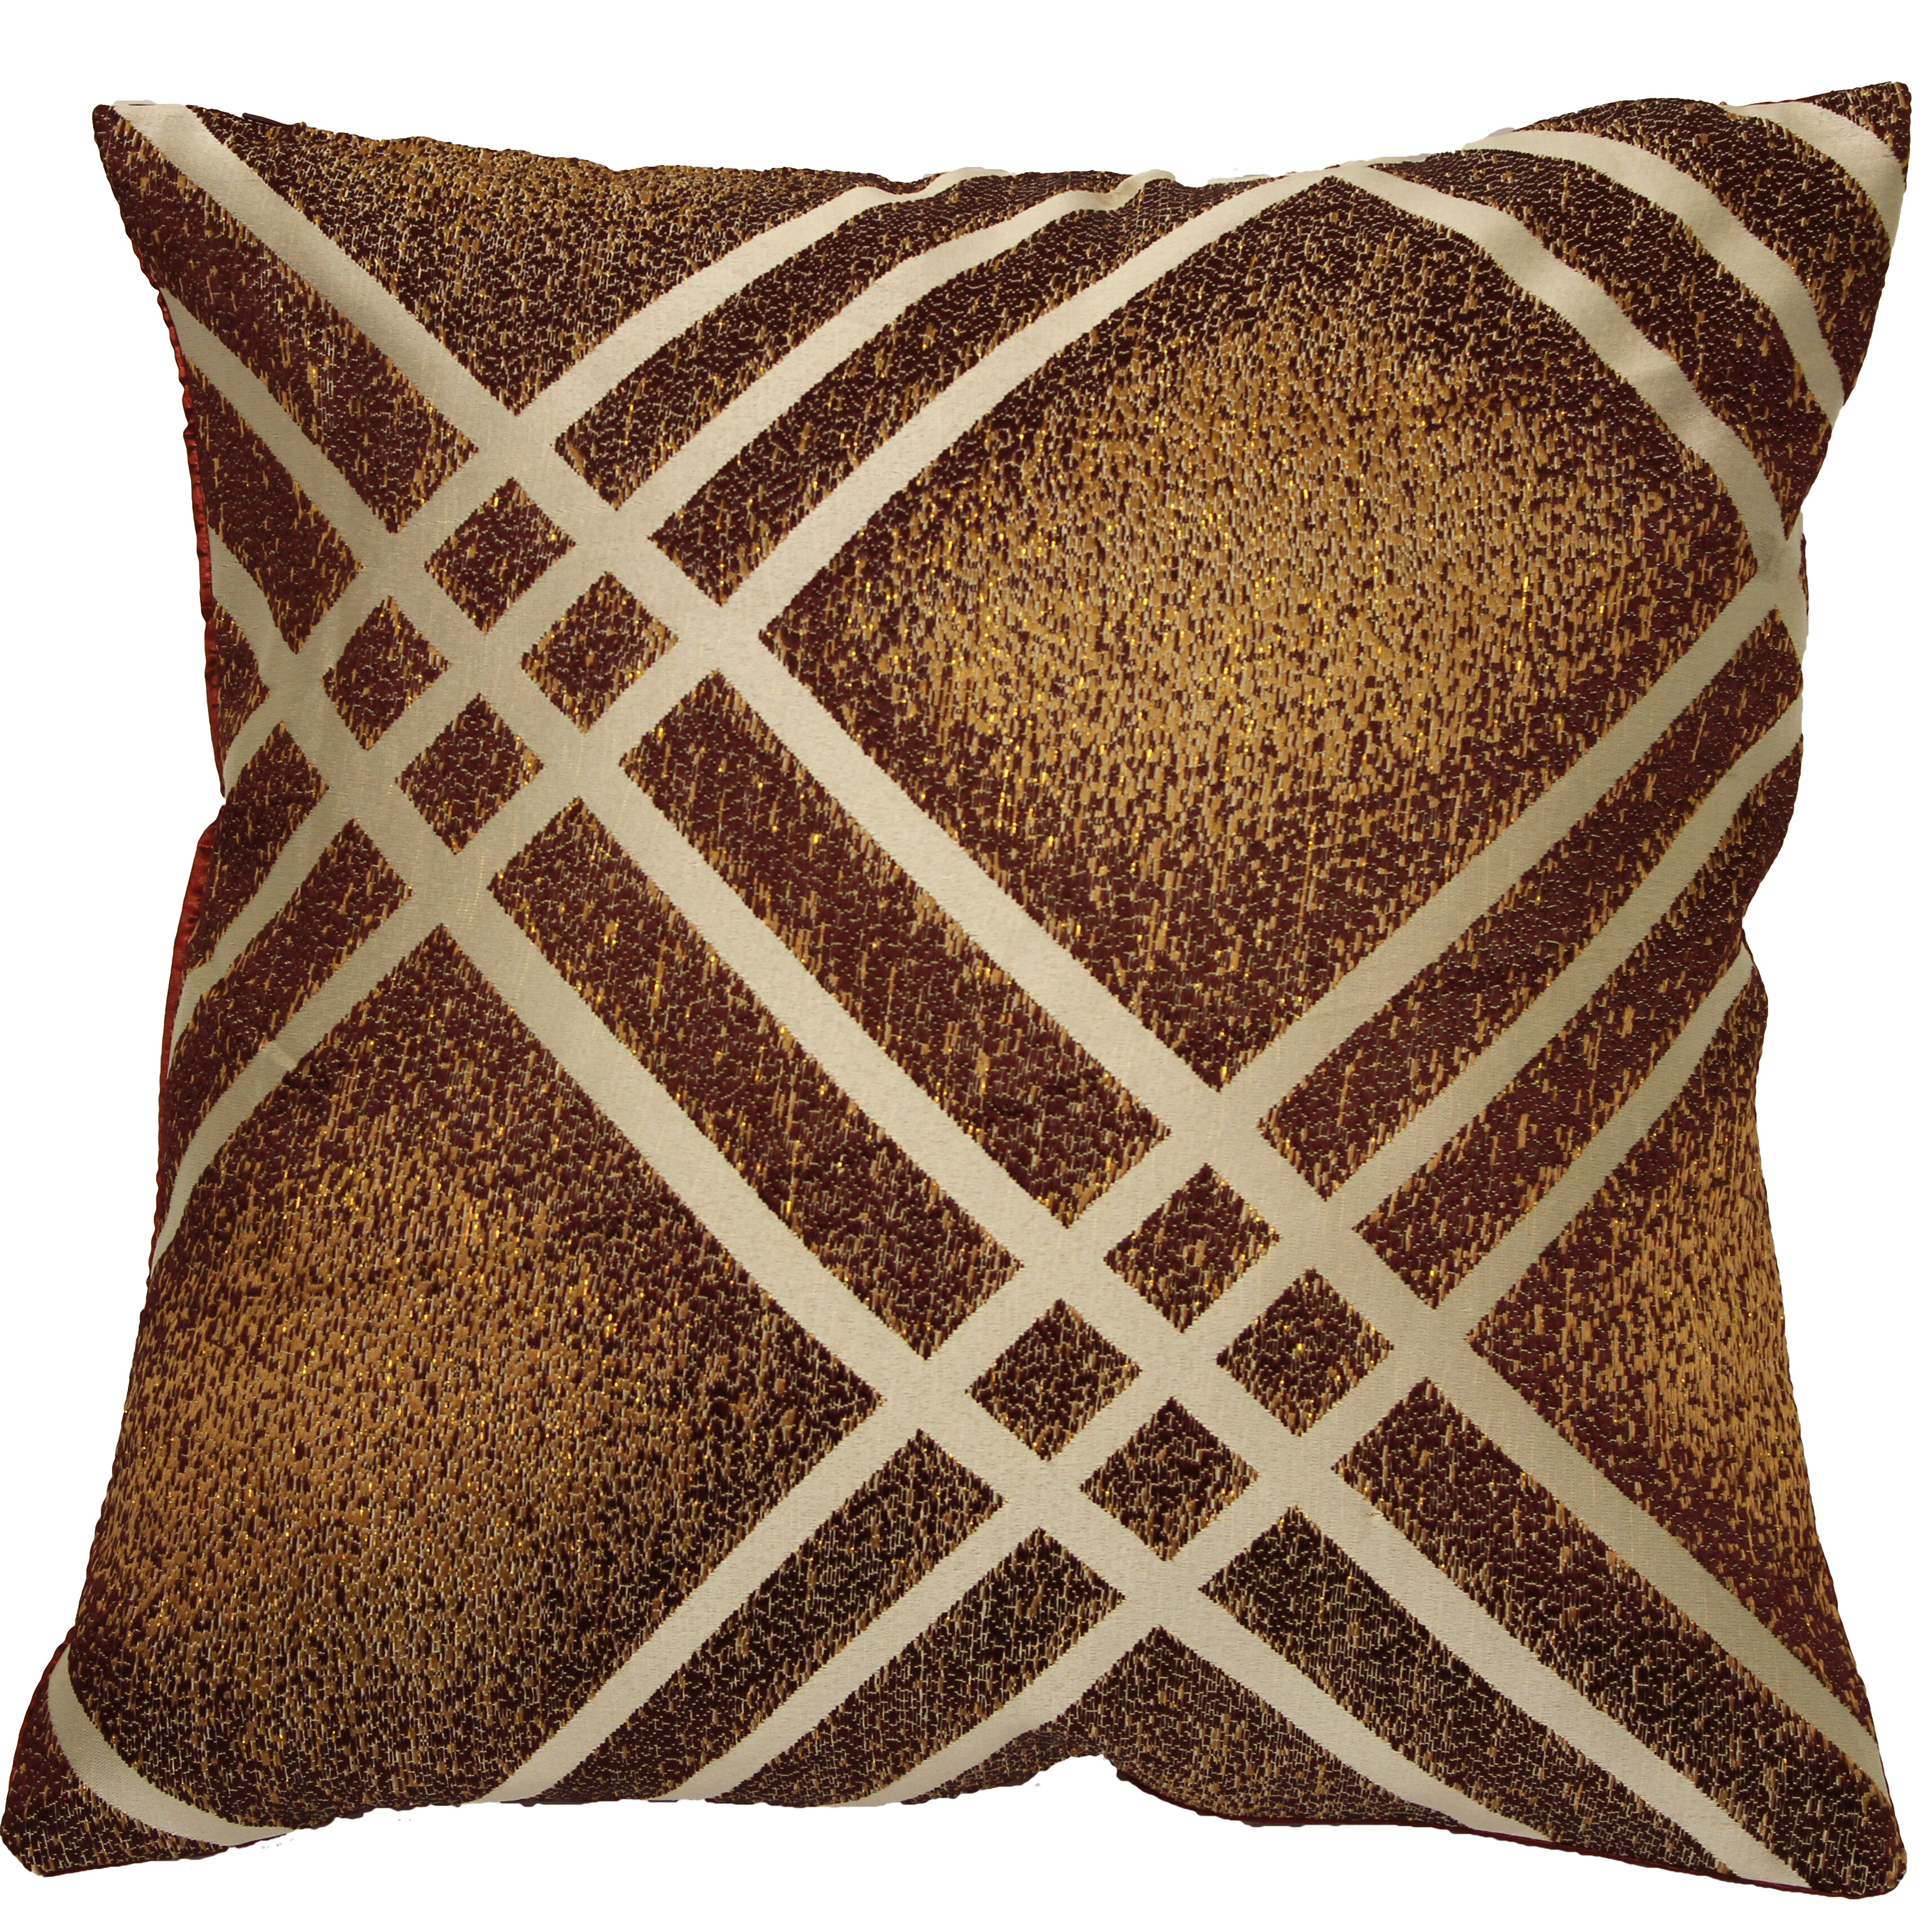 Pillowcase Fleur De Lis Living Sheets Pillowcases You Ll Love In 2021 Wayfair